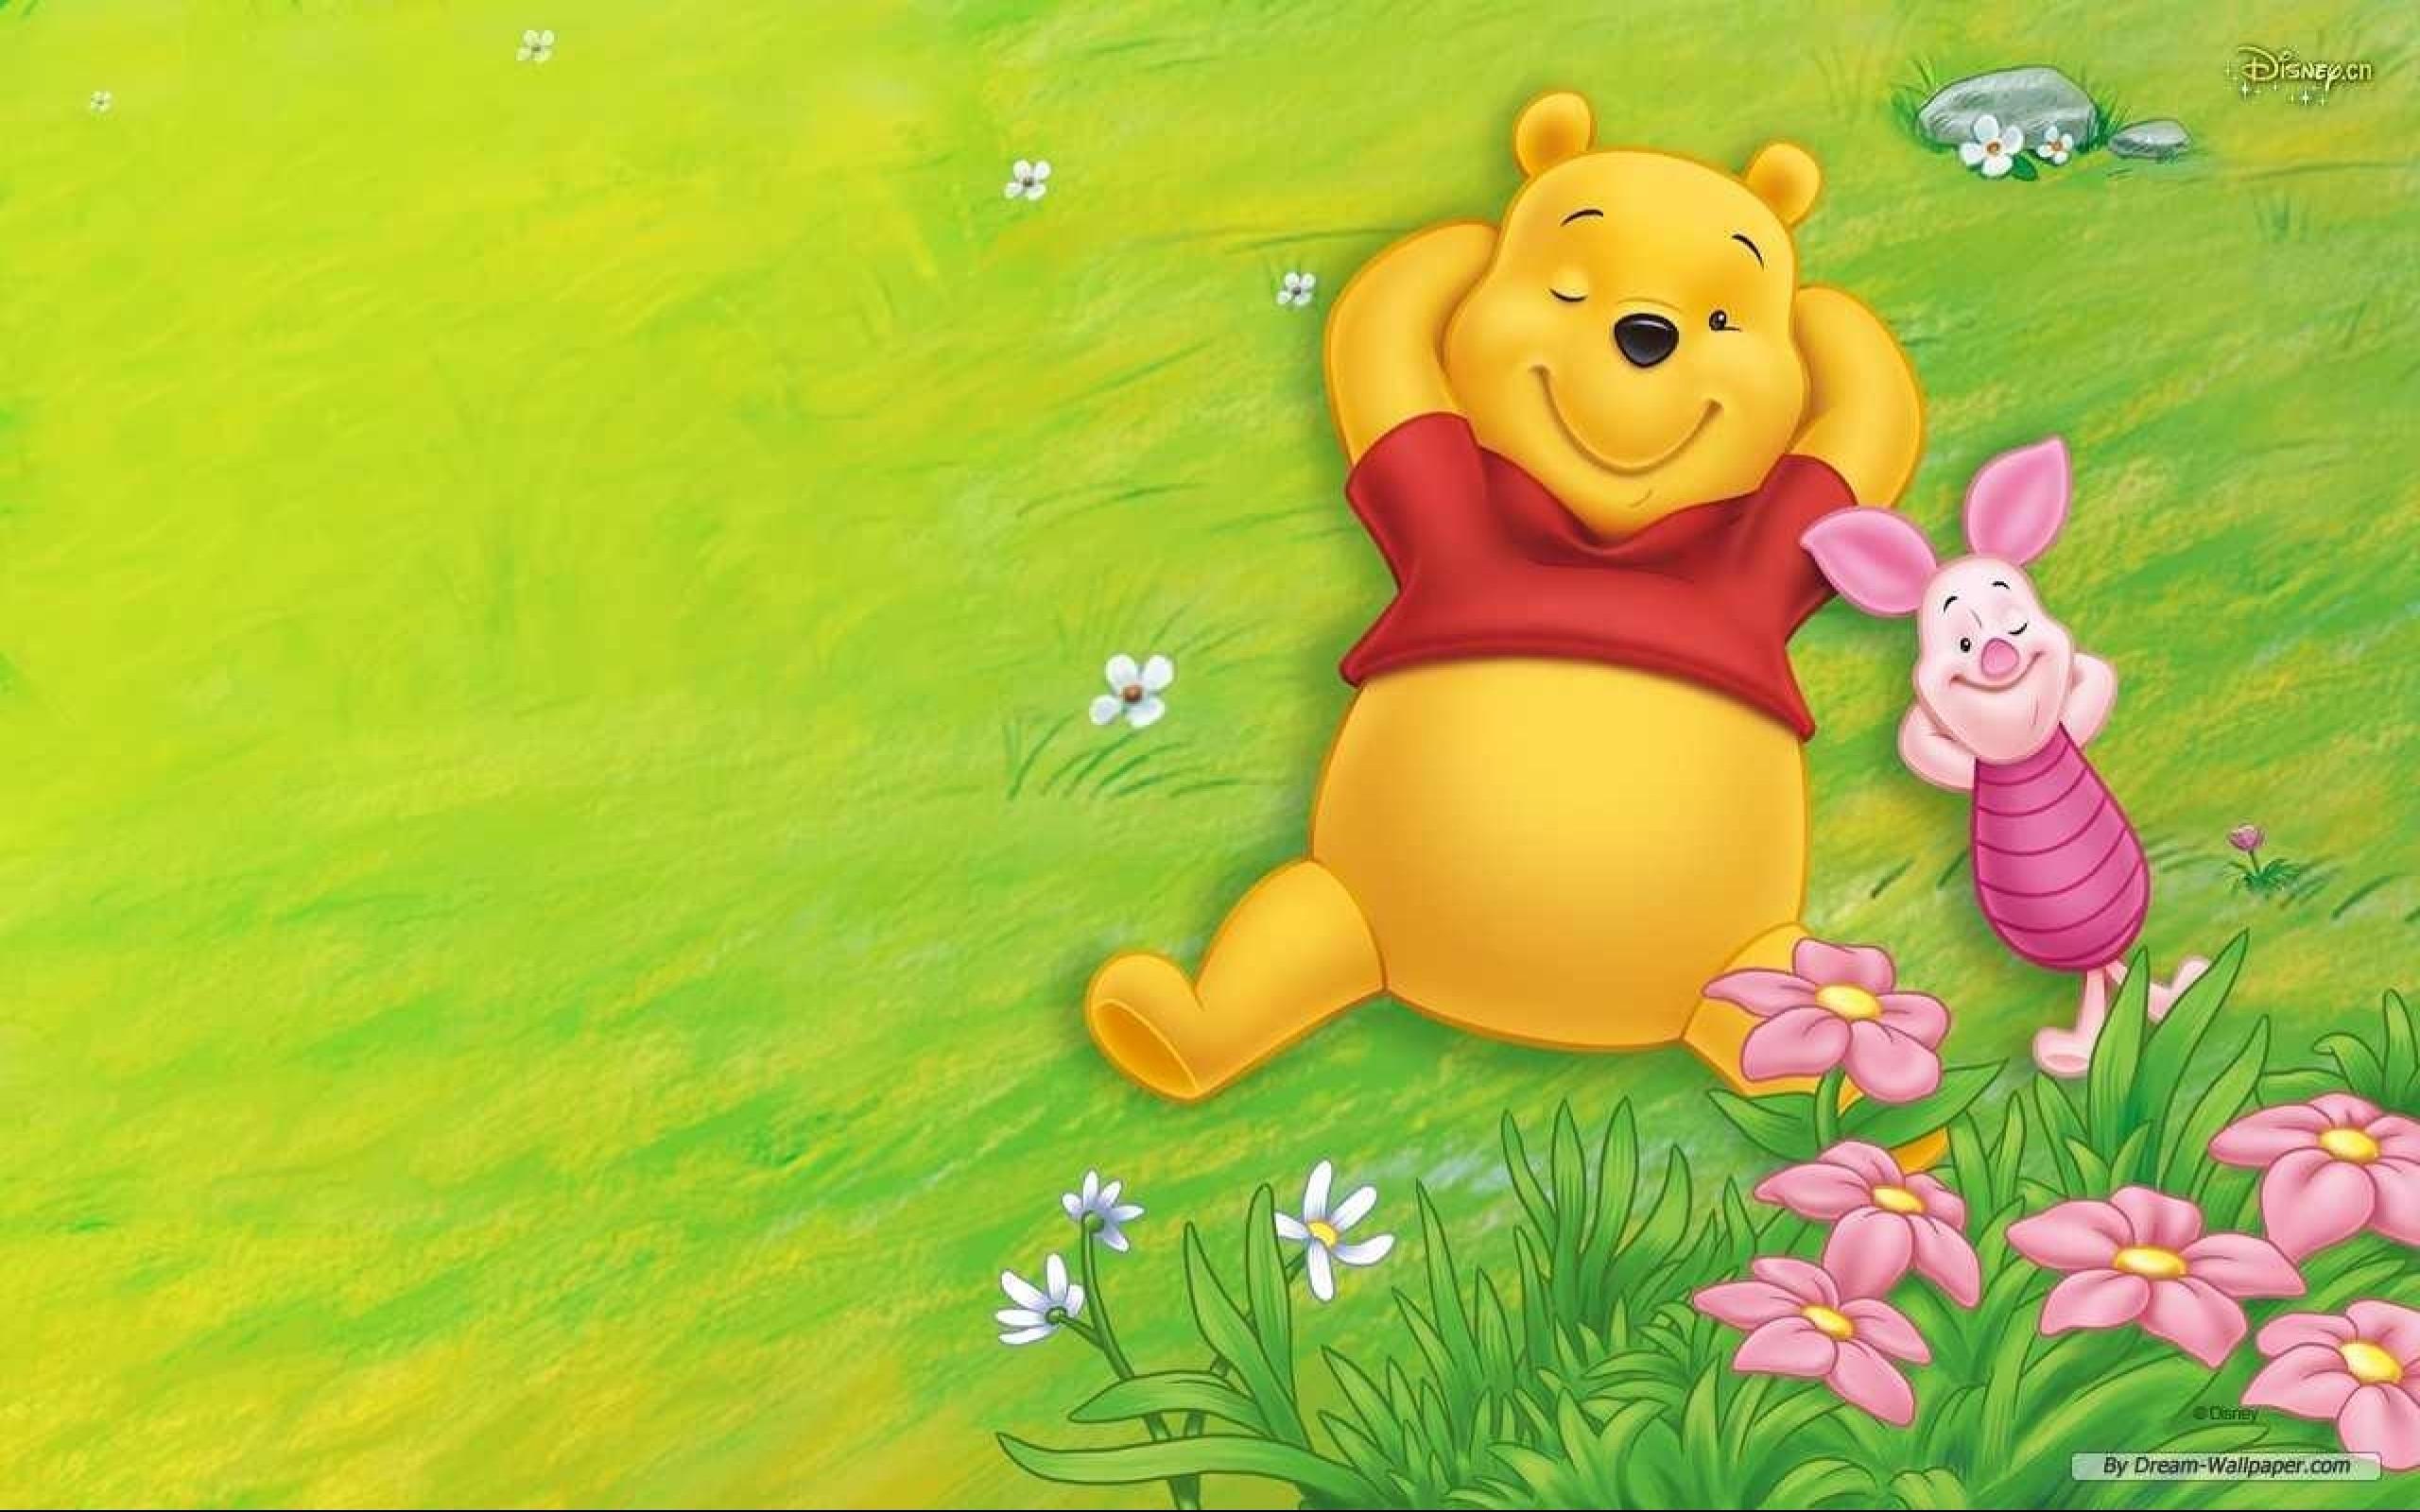 Winnie the pooh wallpapers hd a21 hd desktop wallpapers 4k hd winnie the pooh wallpapers hd a21 altavistaventures Gallery